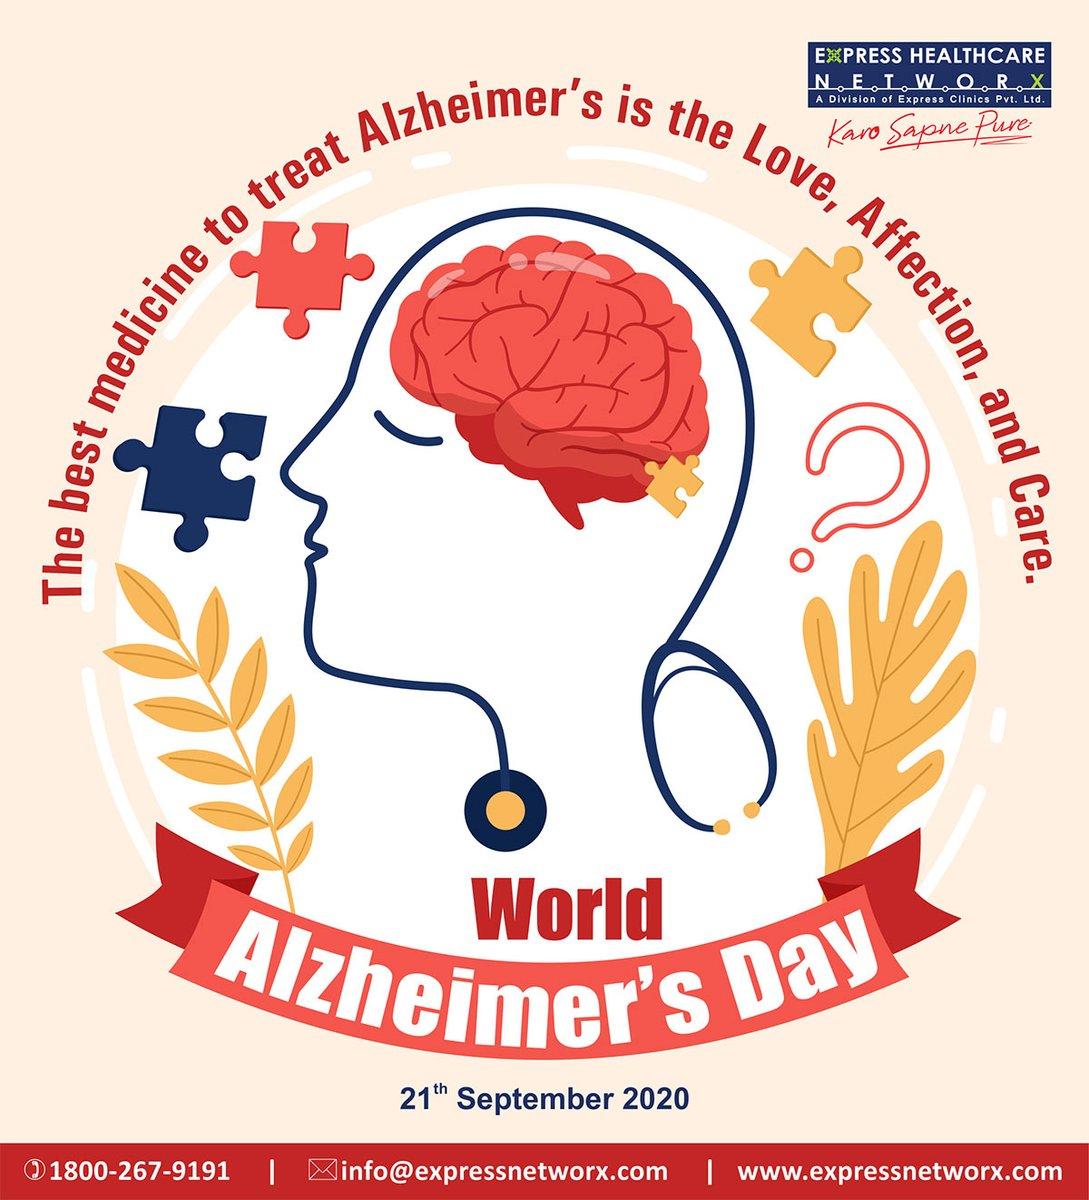 The best medicine to treat Alzheimer's is the Love, Affection, and Care.  Visit - https://t.co/PdoQpJsxq3  #worldalzeimersday #alzheimers #dementia #alzheimersawareness #caregiver #dementiaawareness #seniorcare #alzheimersassociation #alzheimer #dementiacare #alzheimersdisease https://t.co/OAHGSBesmt